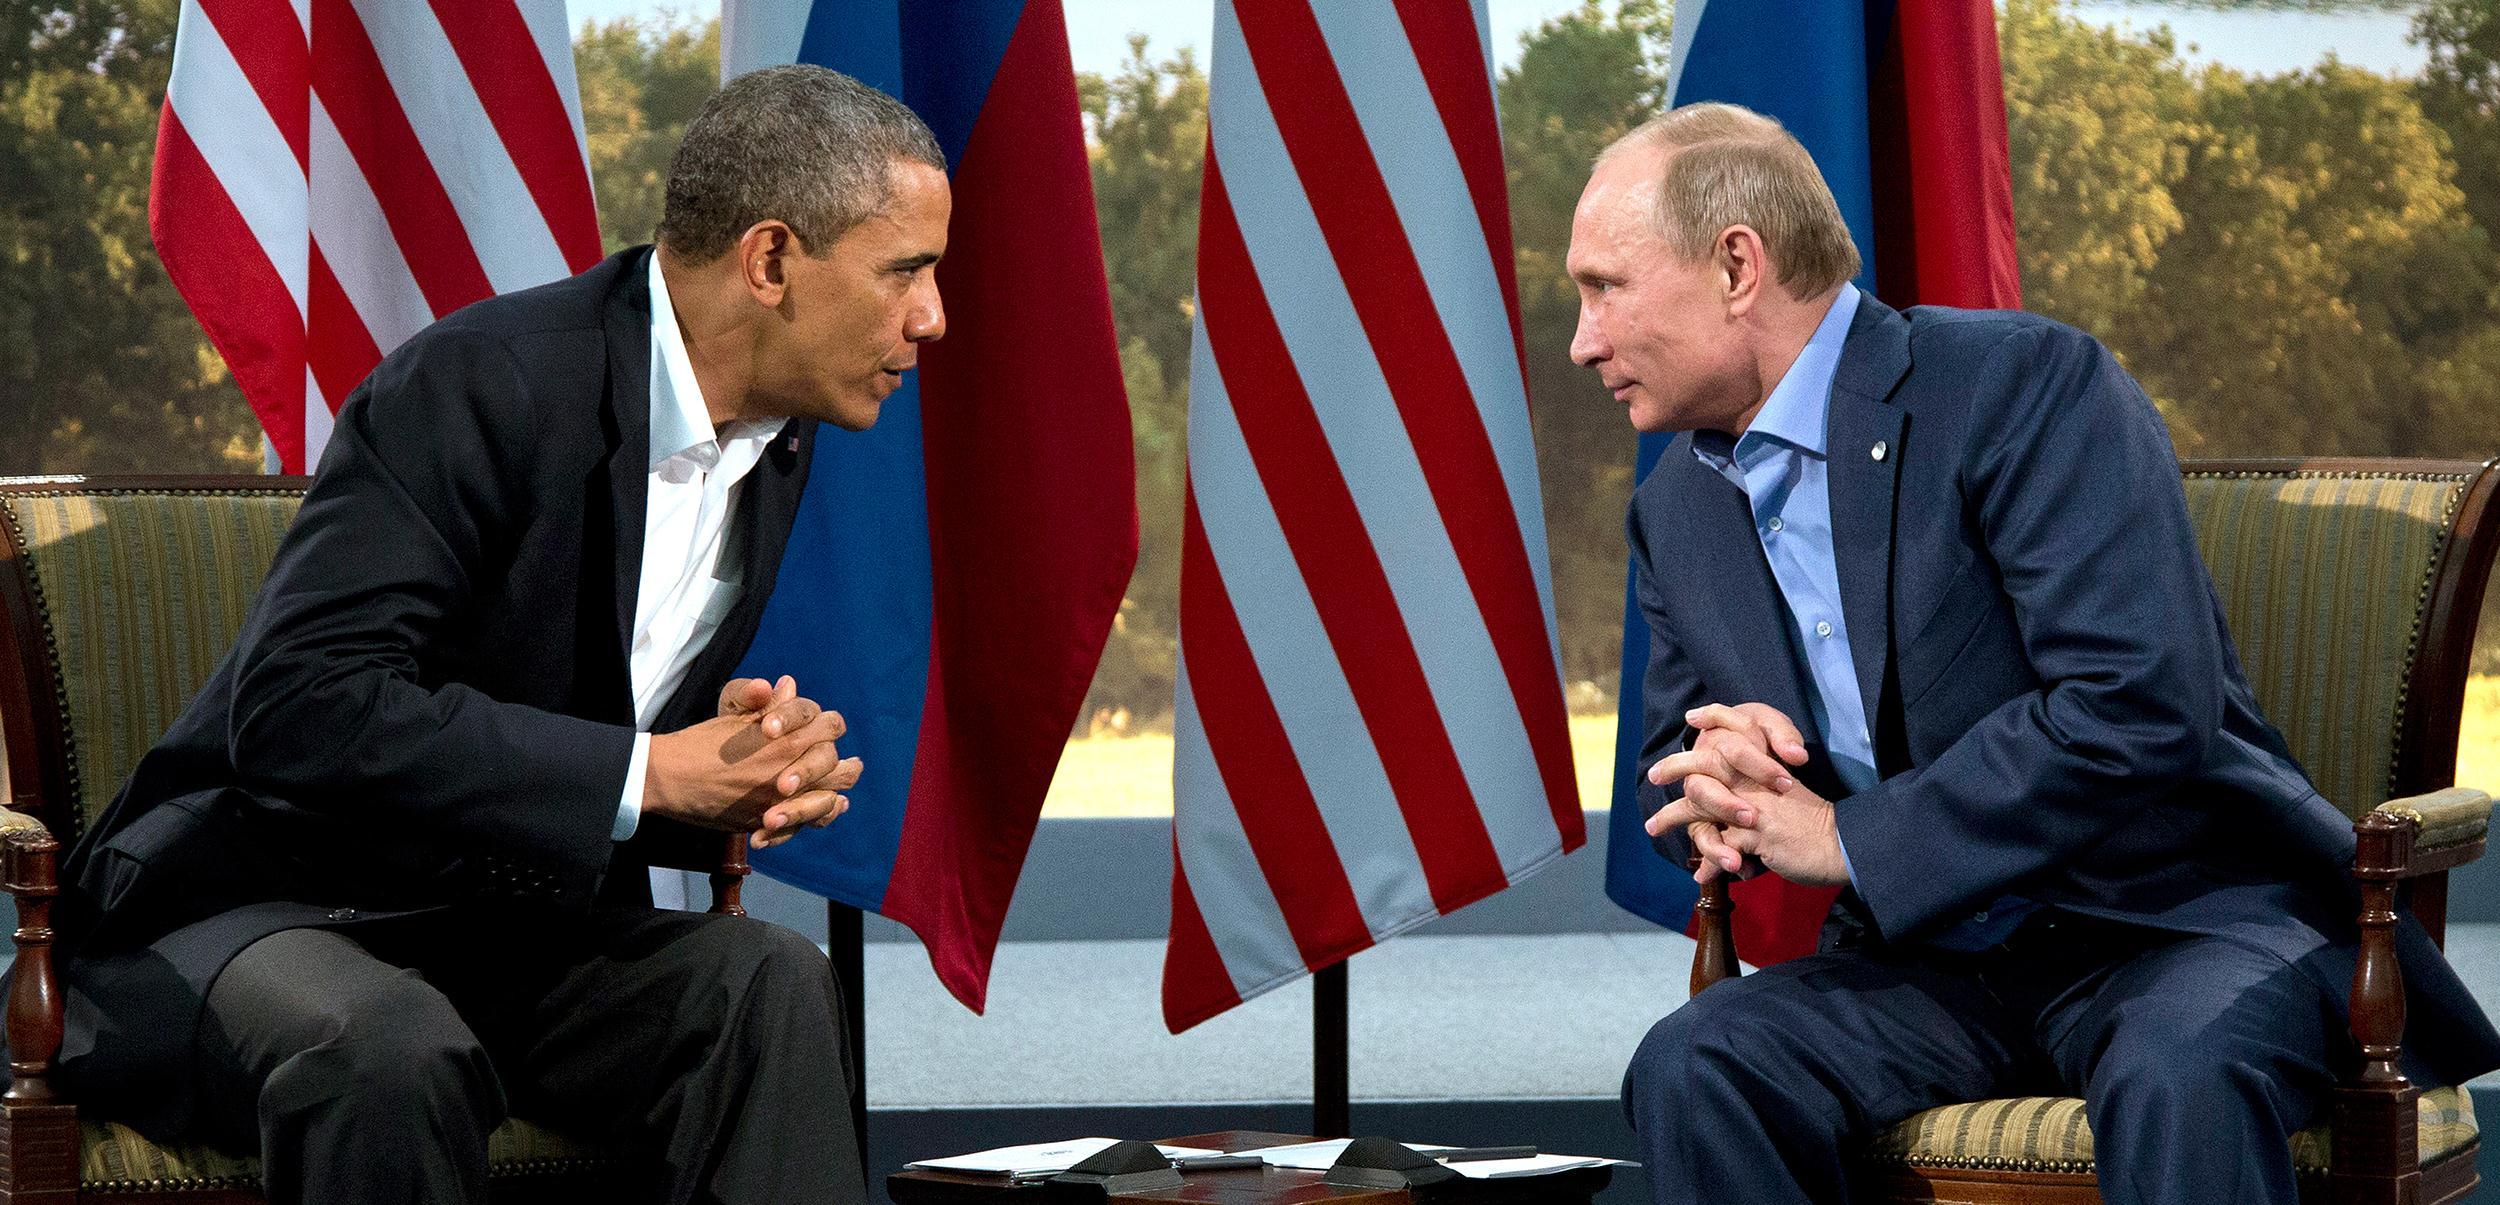 The South Caucasus: Obama's Russia 'Reset' And Putin's Doctrine